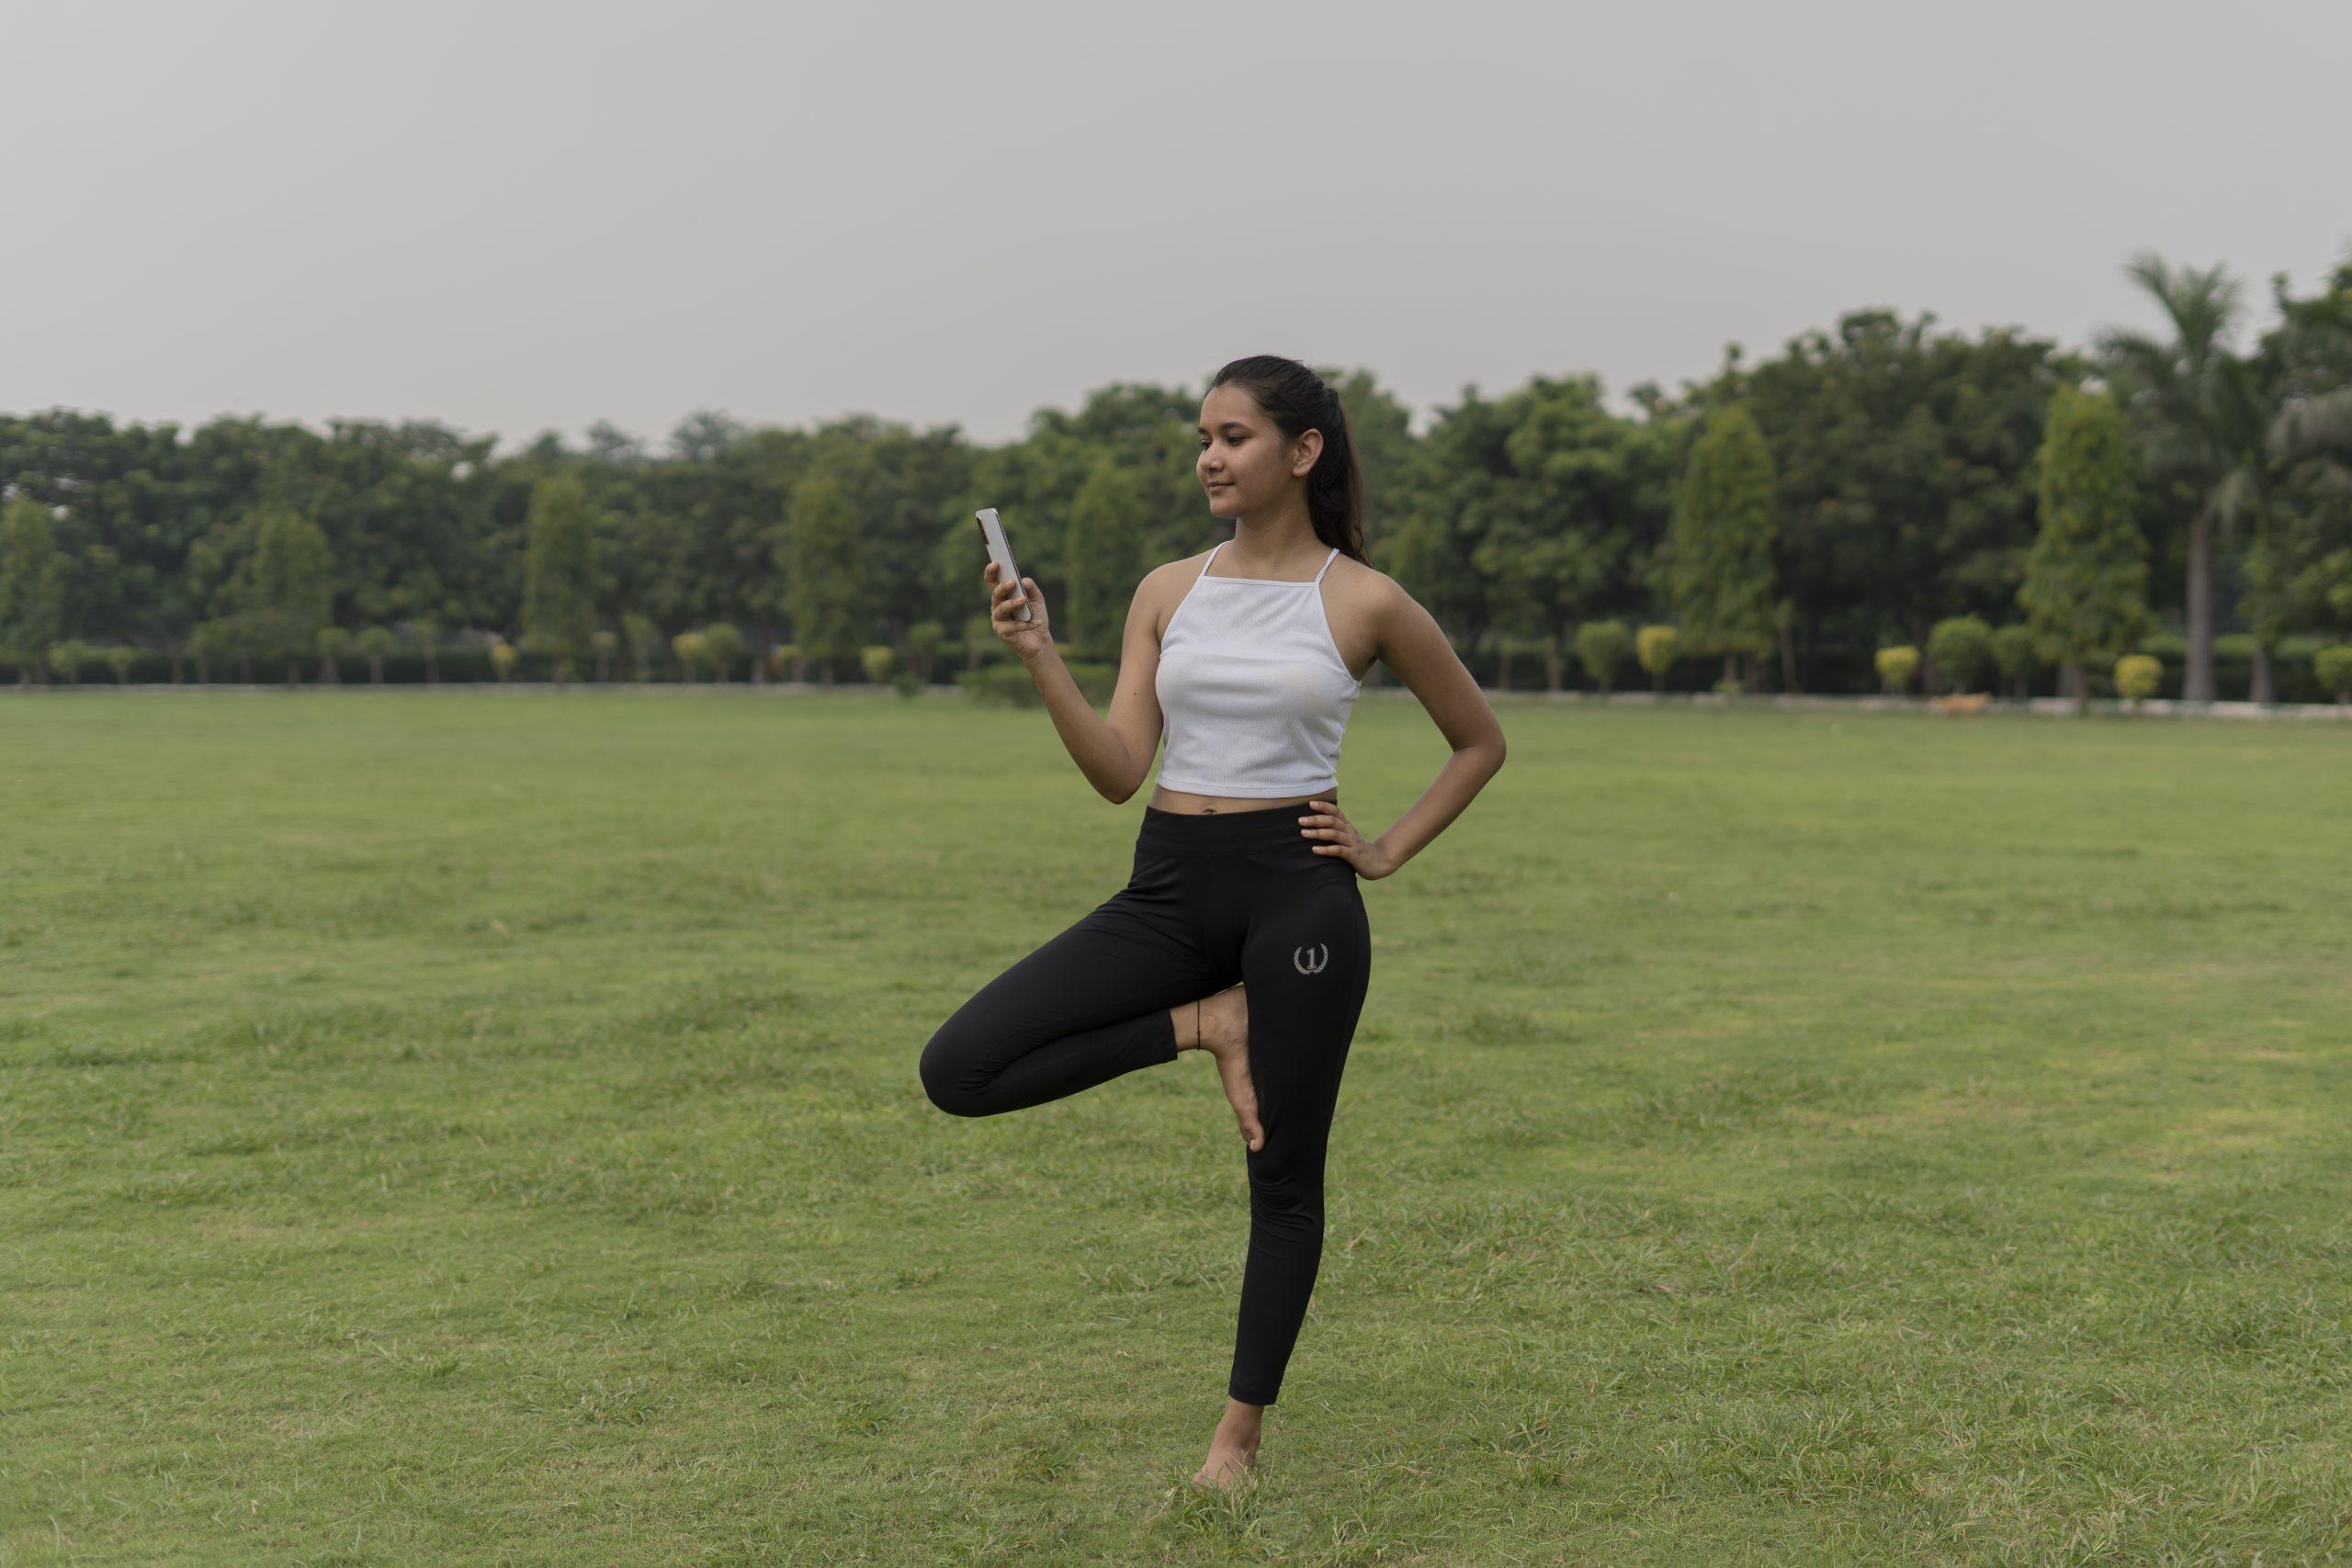 Girl Yoga With Phone